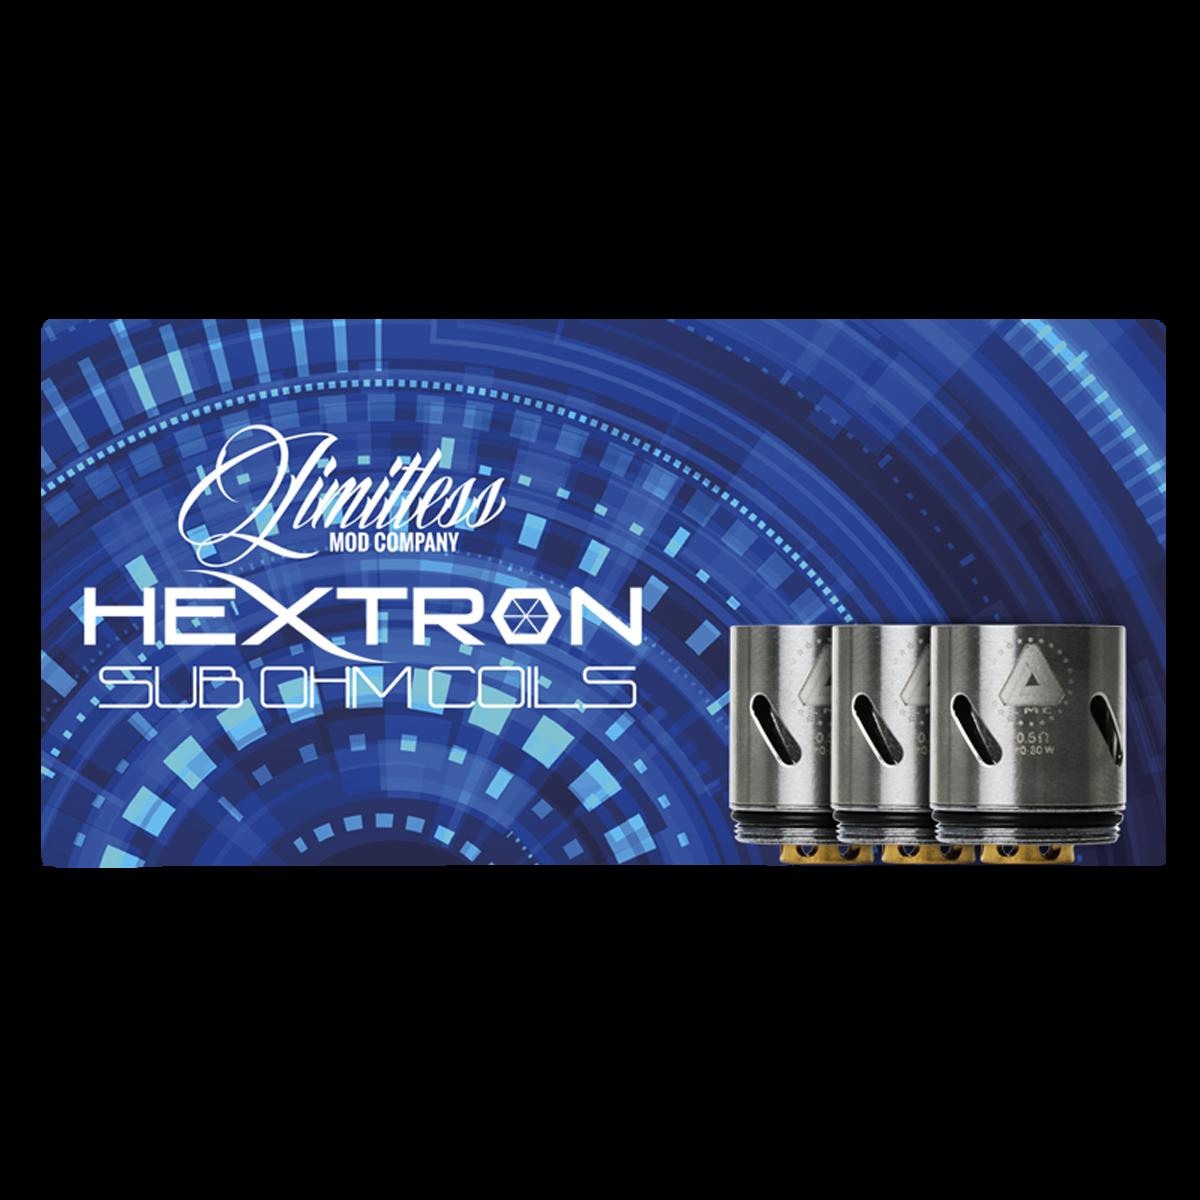 Limitless LMC Hextron Sub Ohm Coils - 0.5 Ohm - Pack of 3